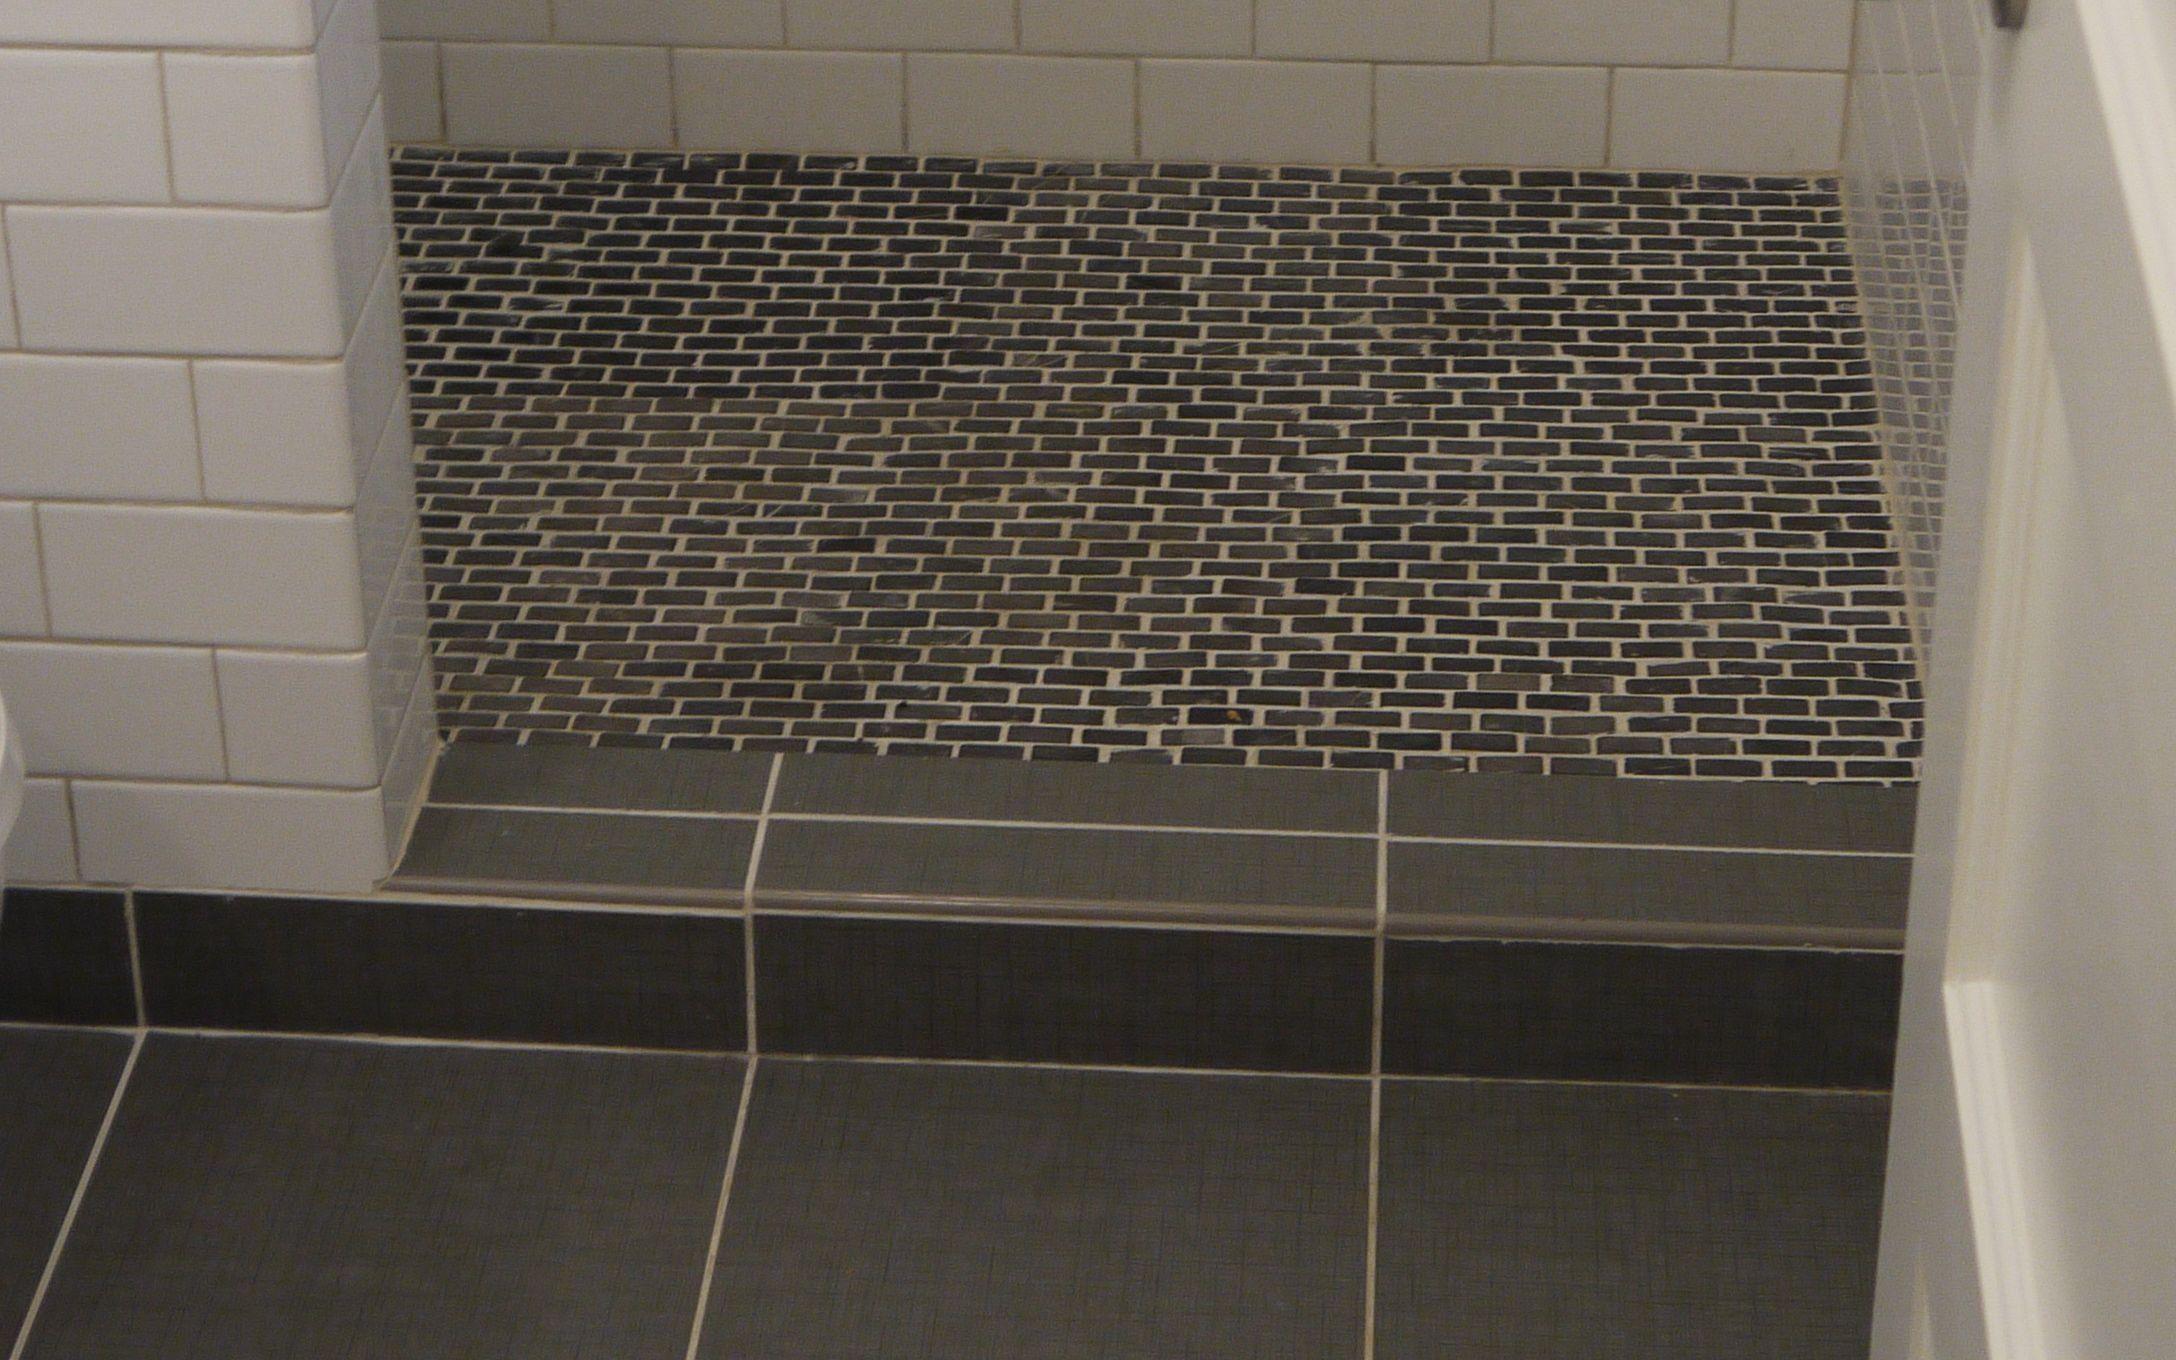 Flooring options for shower bathroom ideas pinterest flooring